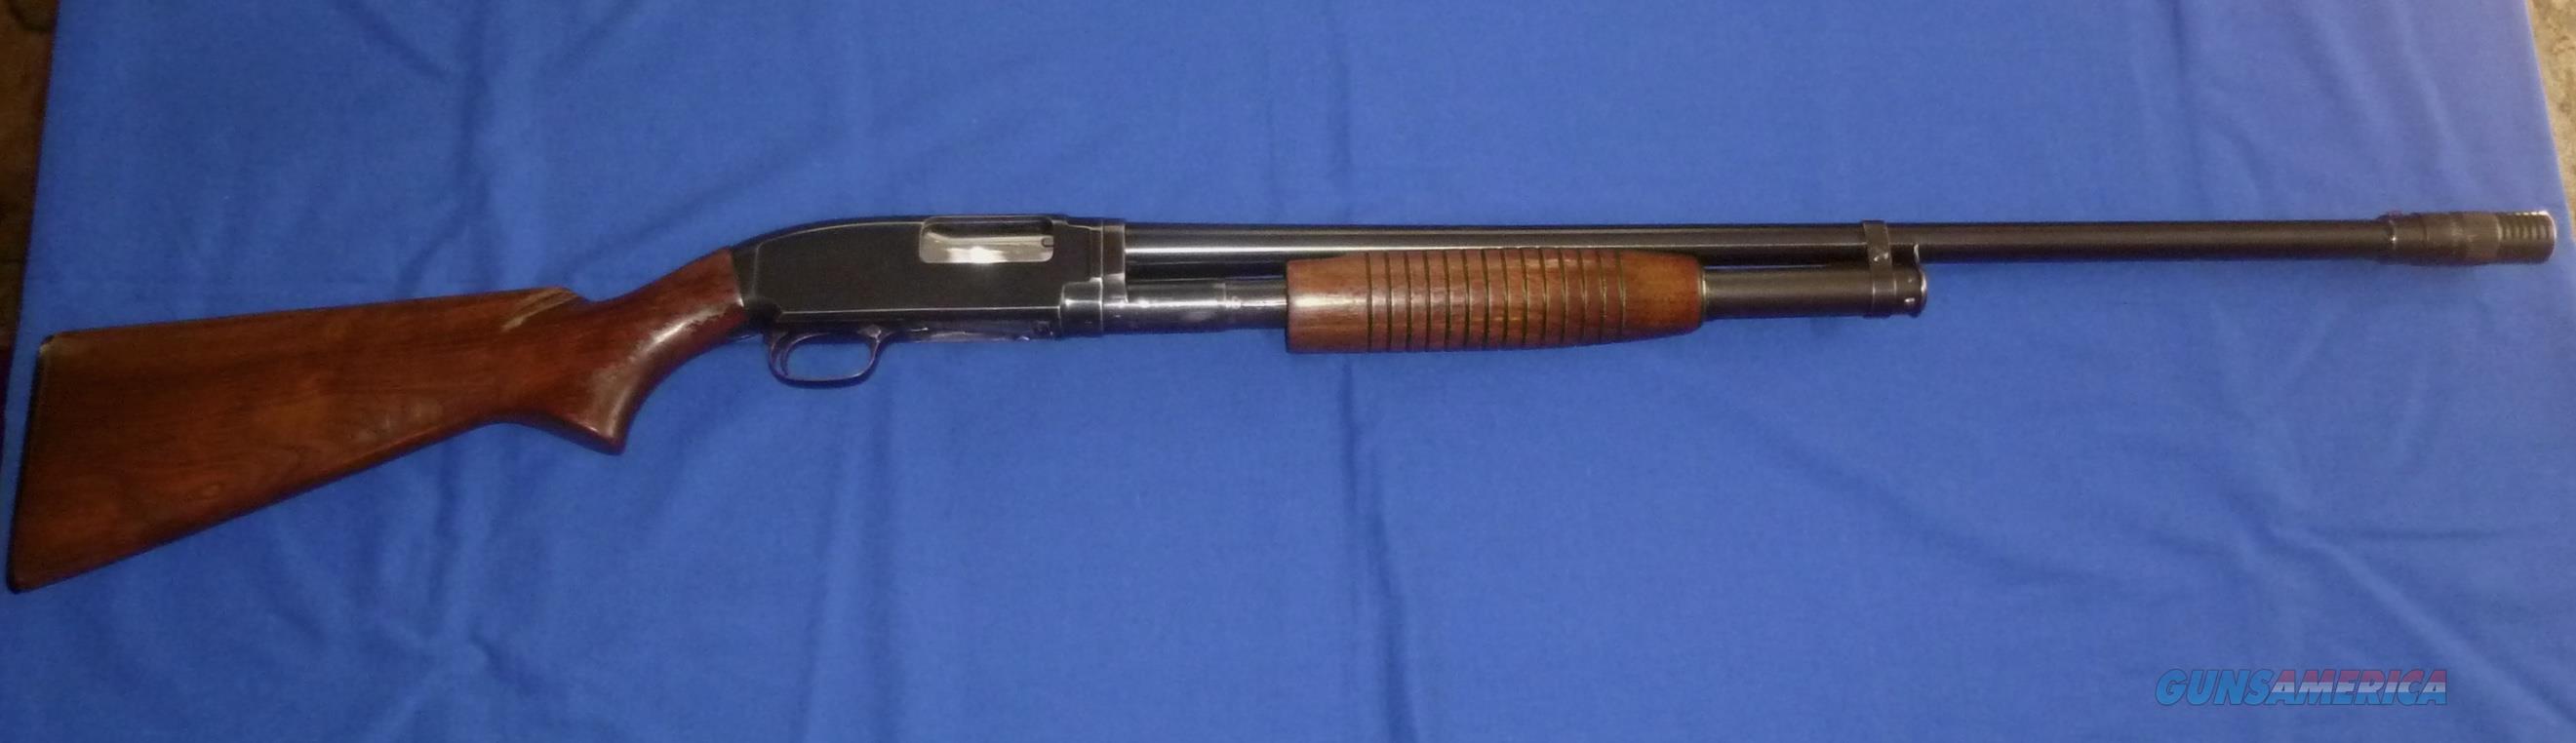 WINCHESTER MODEL 12 12 GAUGE PUMP SHOTGUN W/POLYCHOKE  Guns > Shotguns > Winchester Shotguns - Modern > Pump Action > Hunting